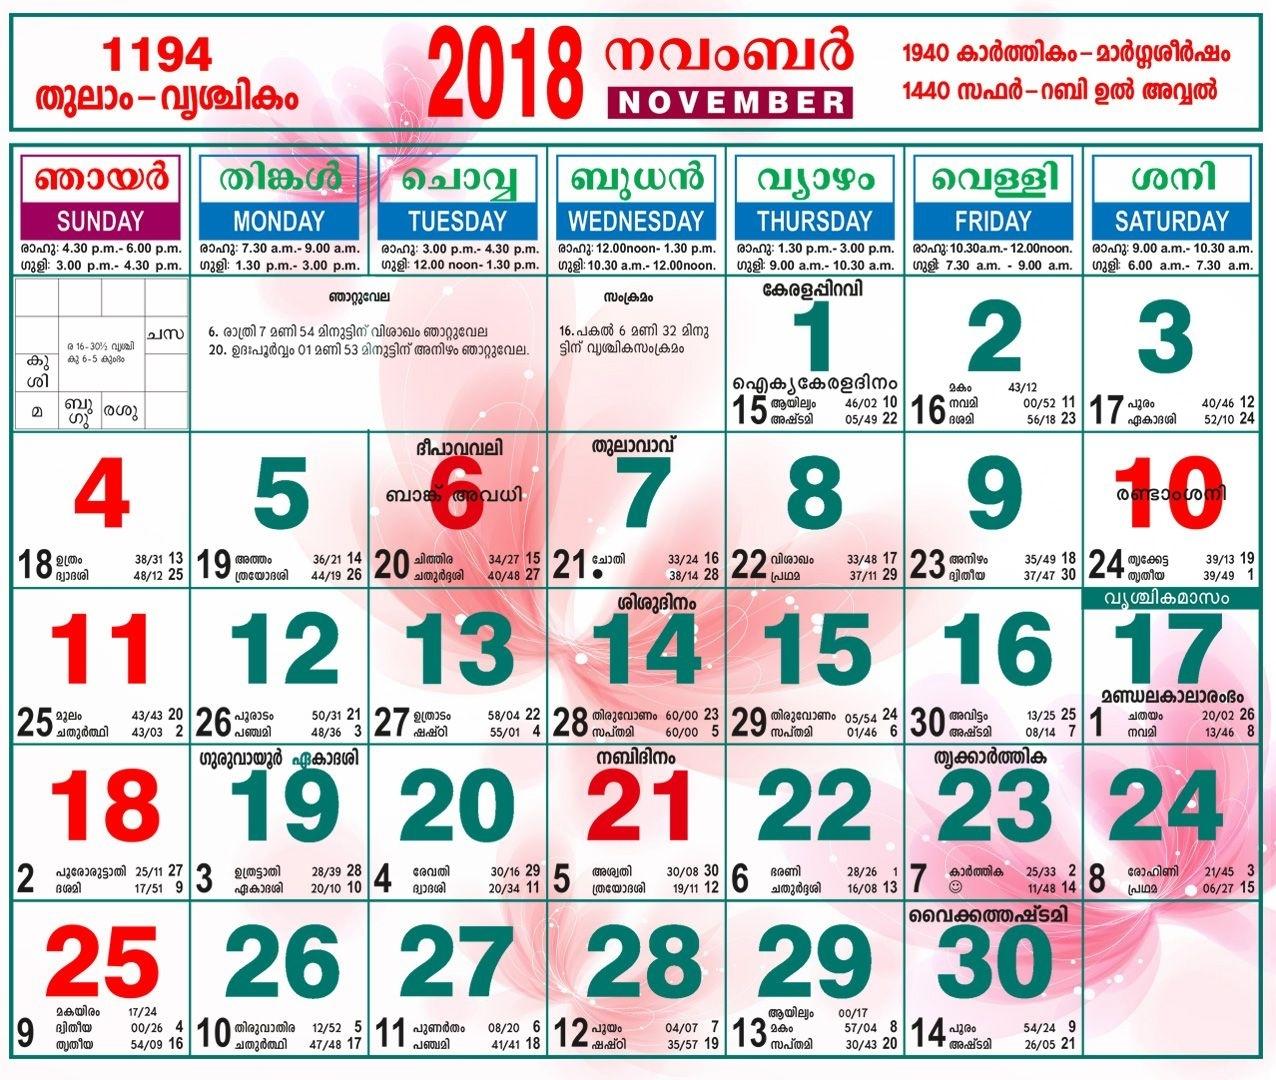 Malayalam Calender Of This Month  Calendar Inspiration Design throughout Malayalam Calendar 2001